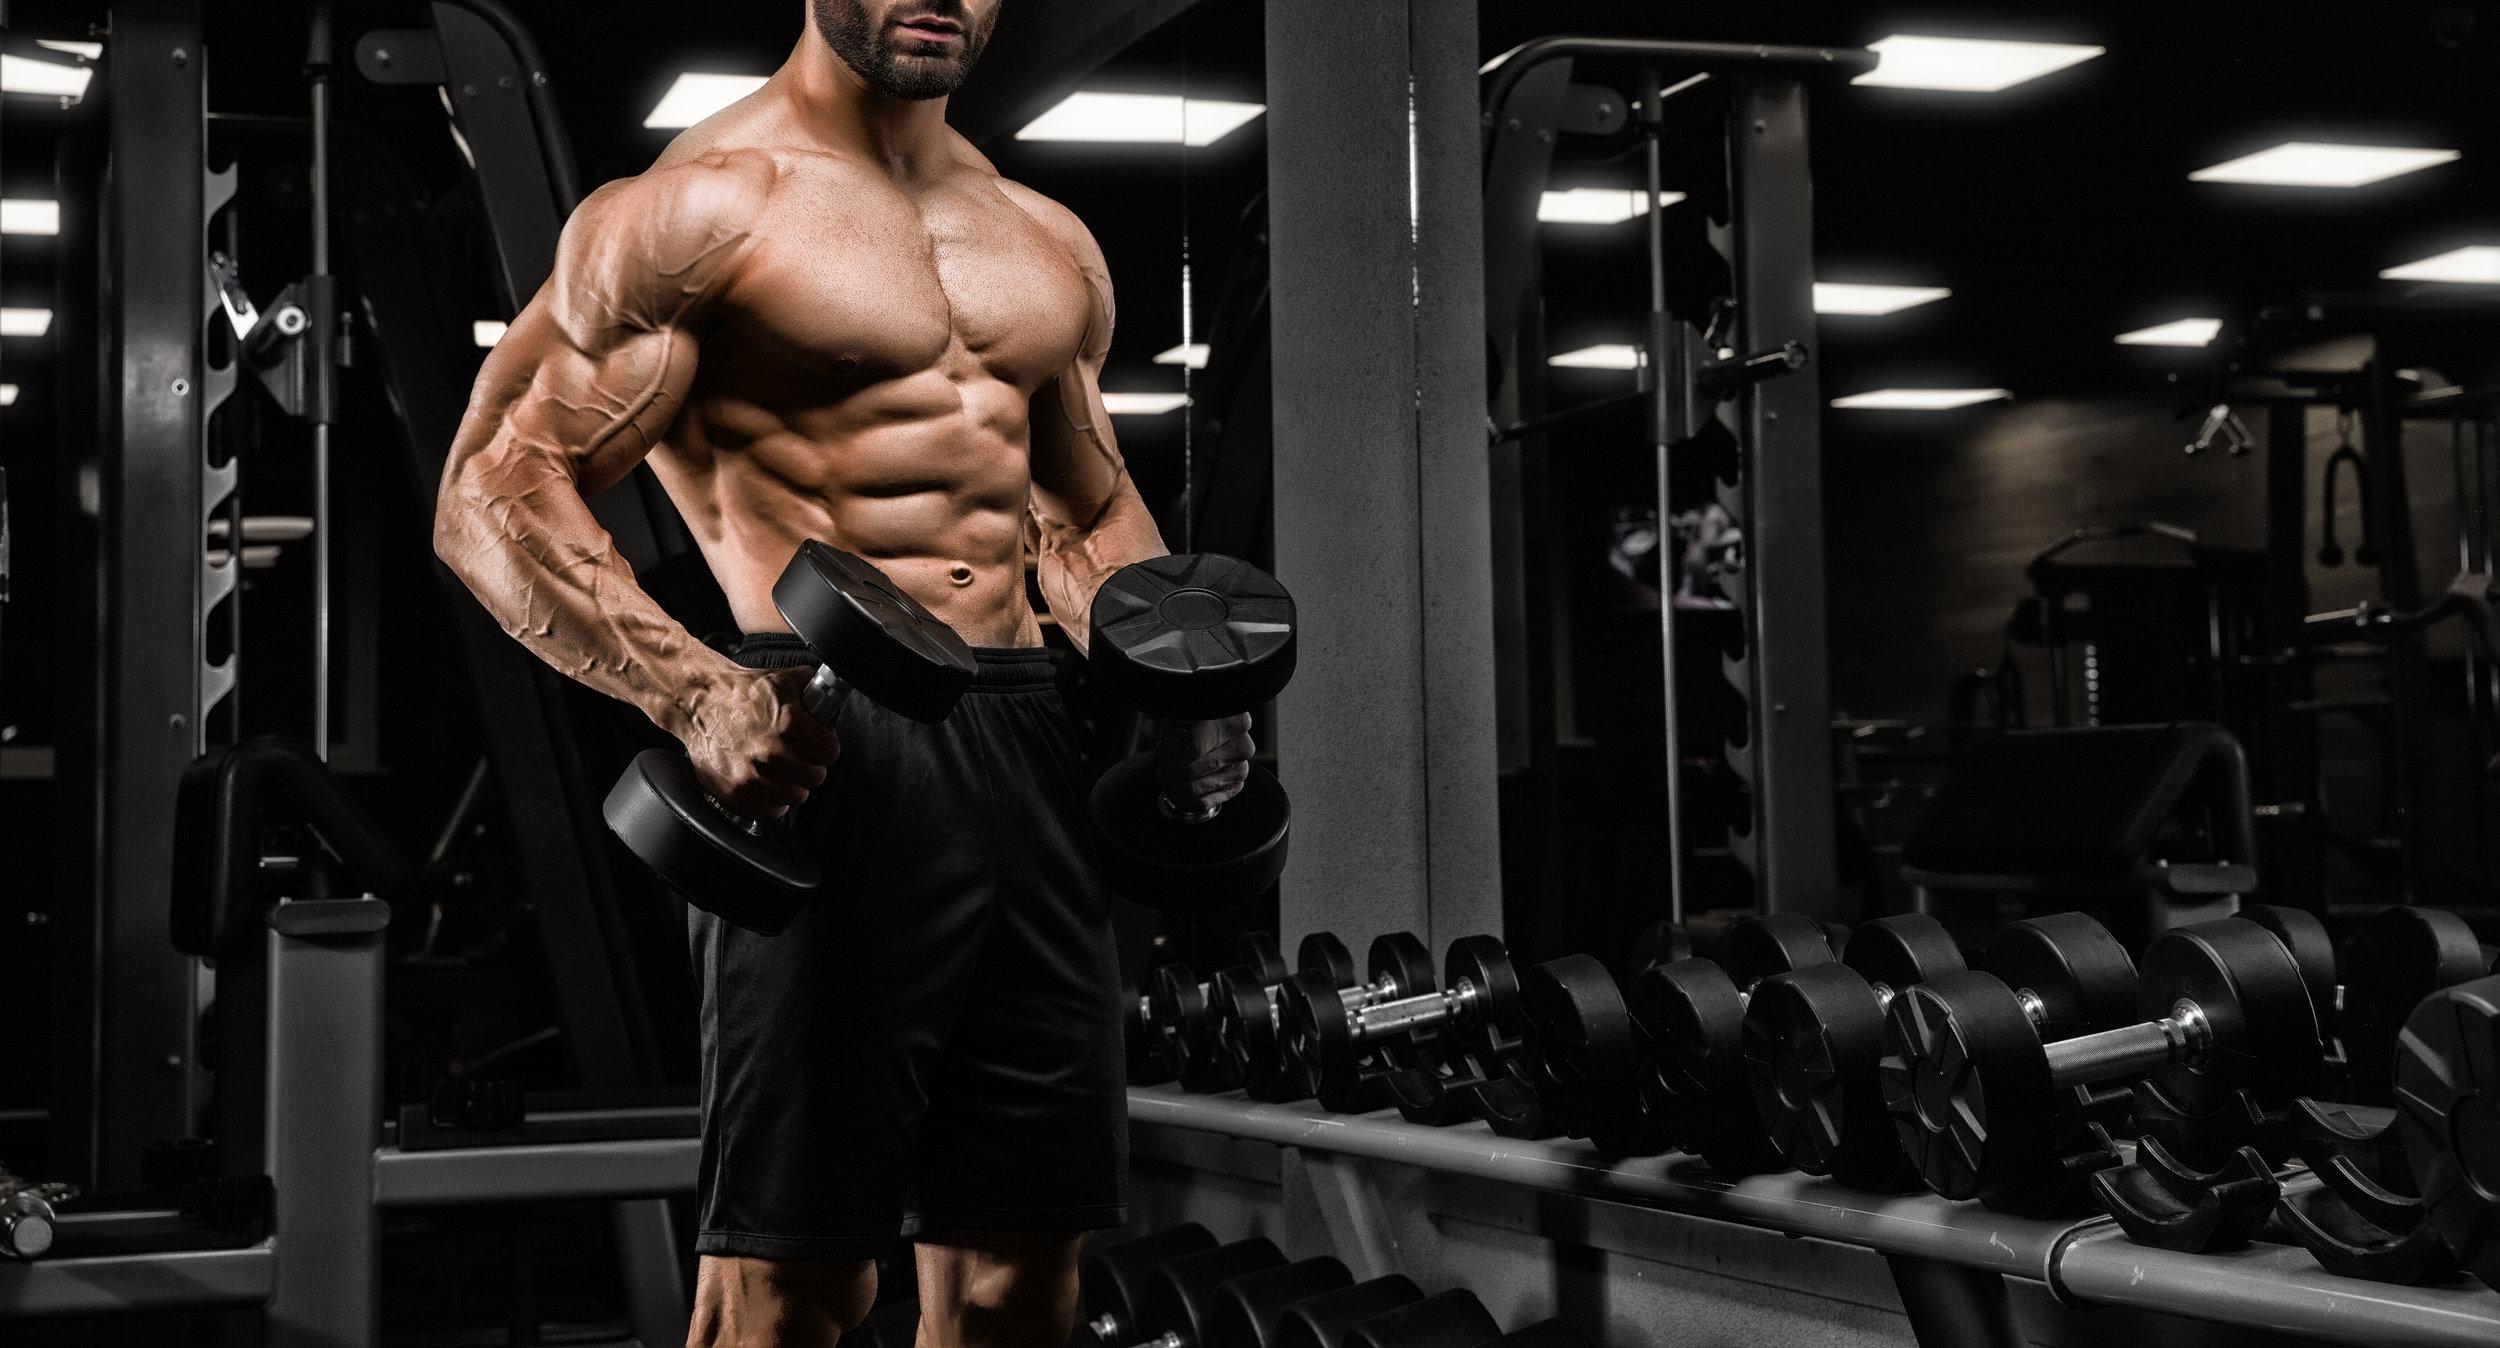 gain muscle mass sarms